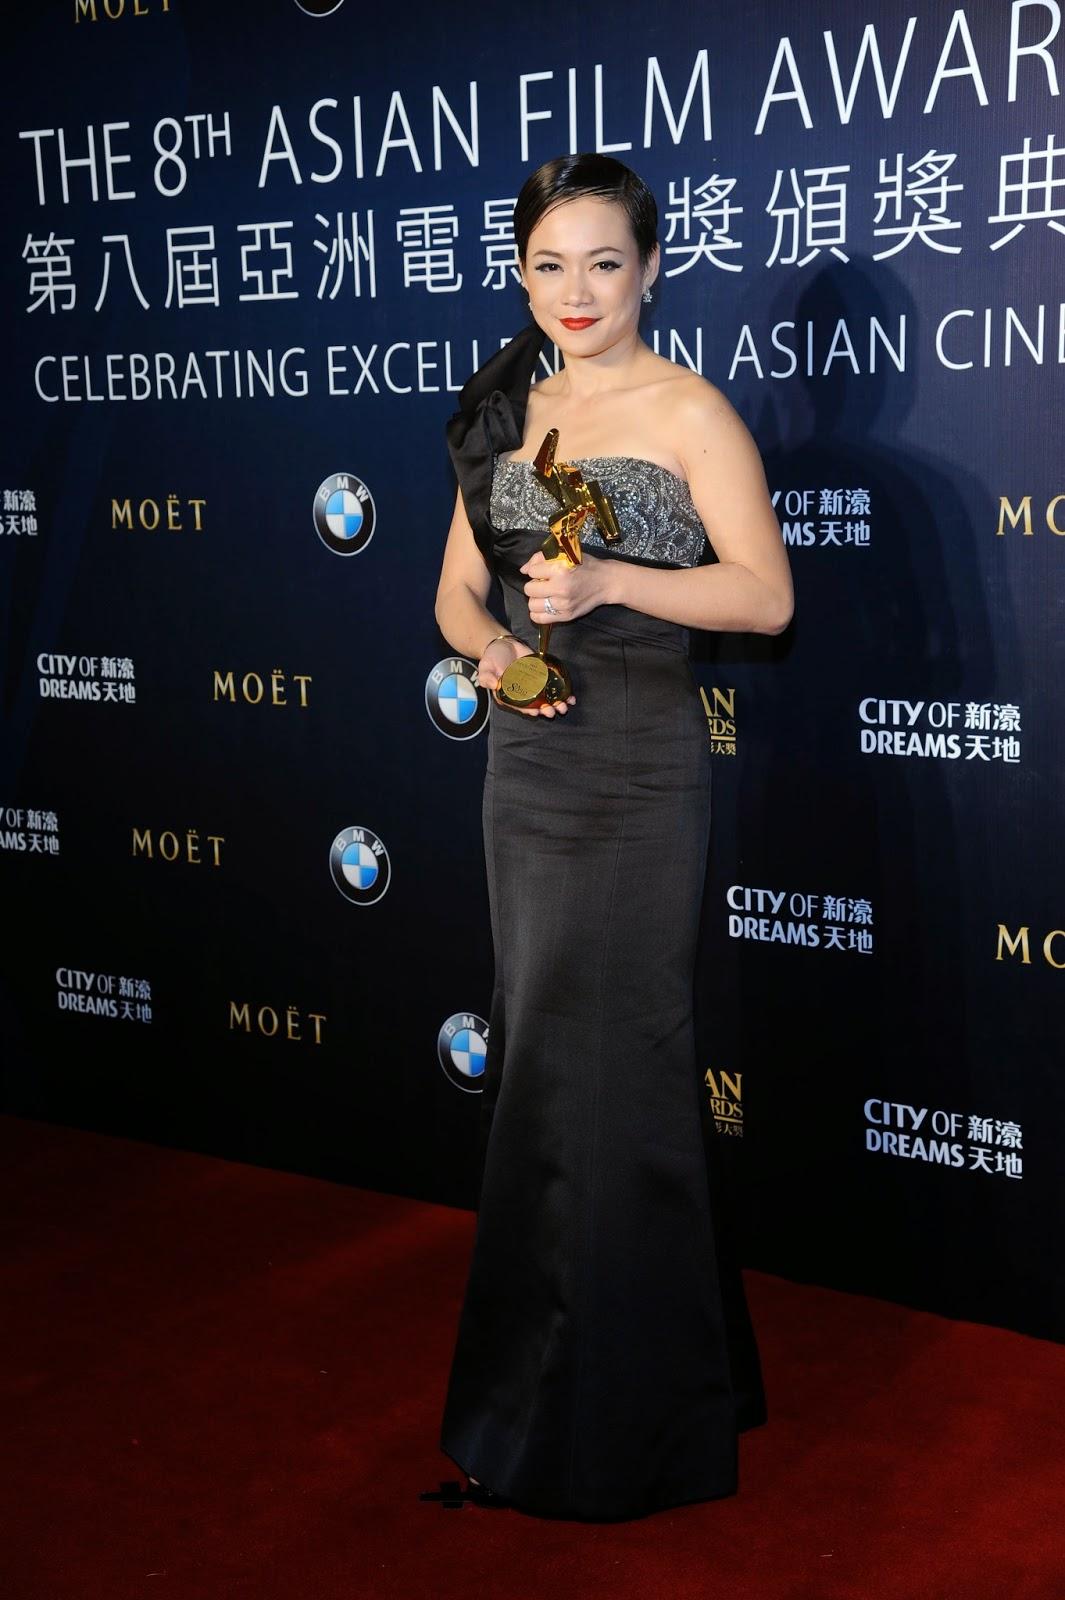 Yeo Yann Yann (Ilo Ilo) won Best Supporting Actress at the 8th AFA